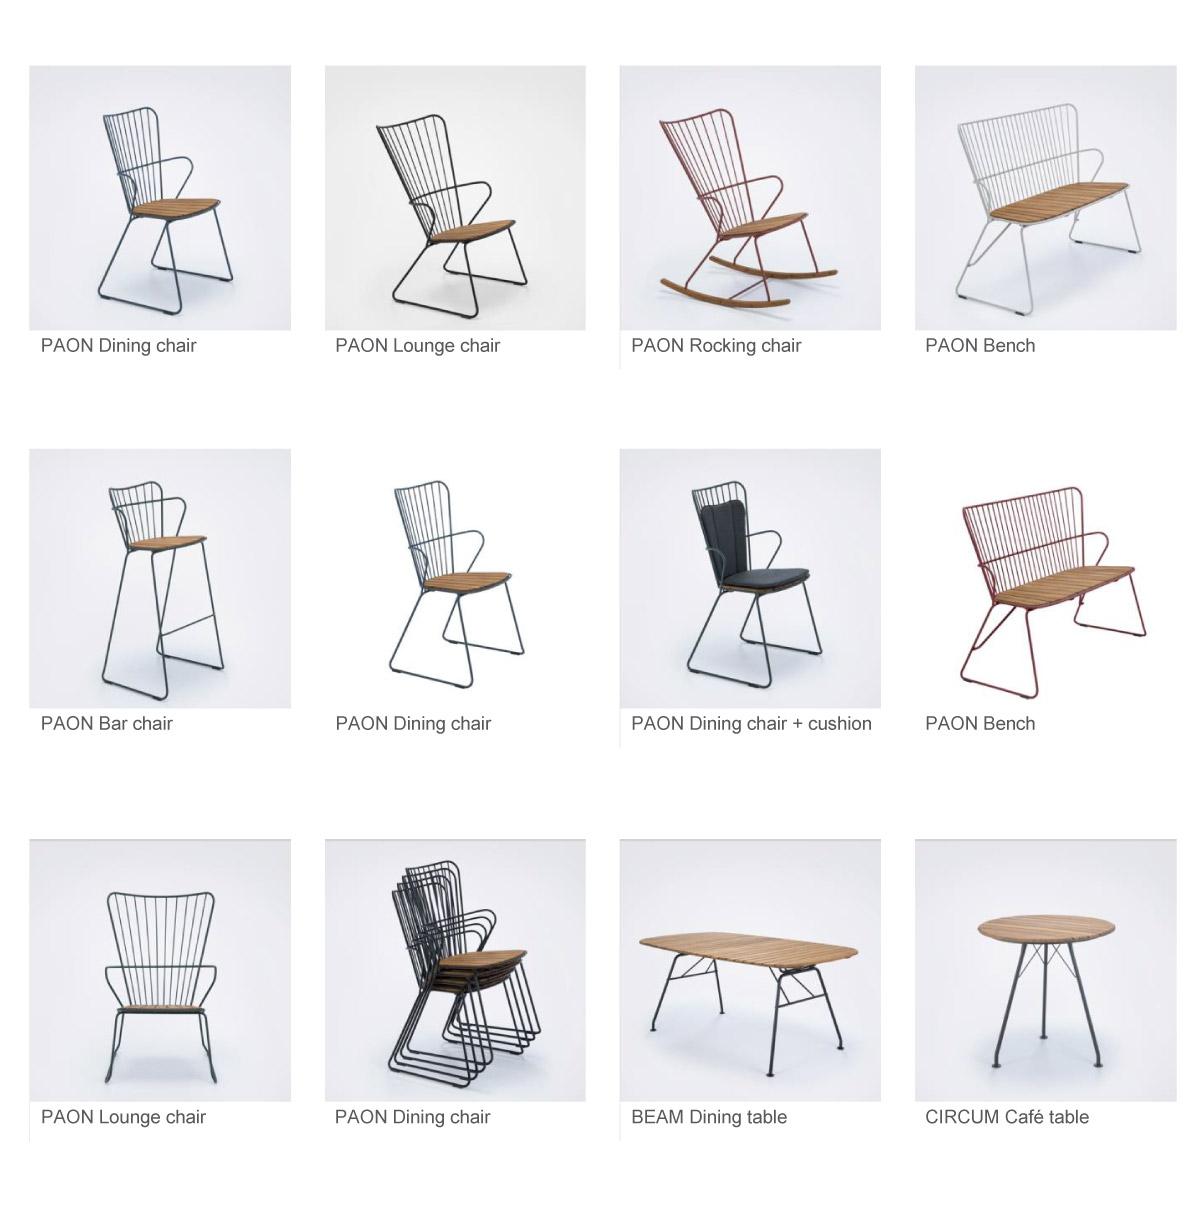 PAON, BEAN and CIRCUM Outdoor Furniture